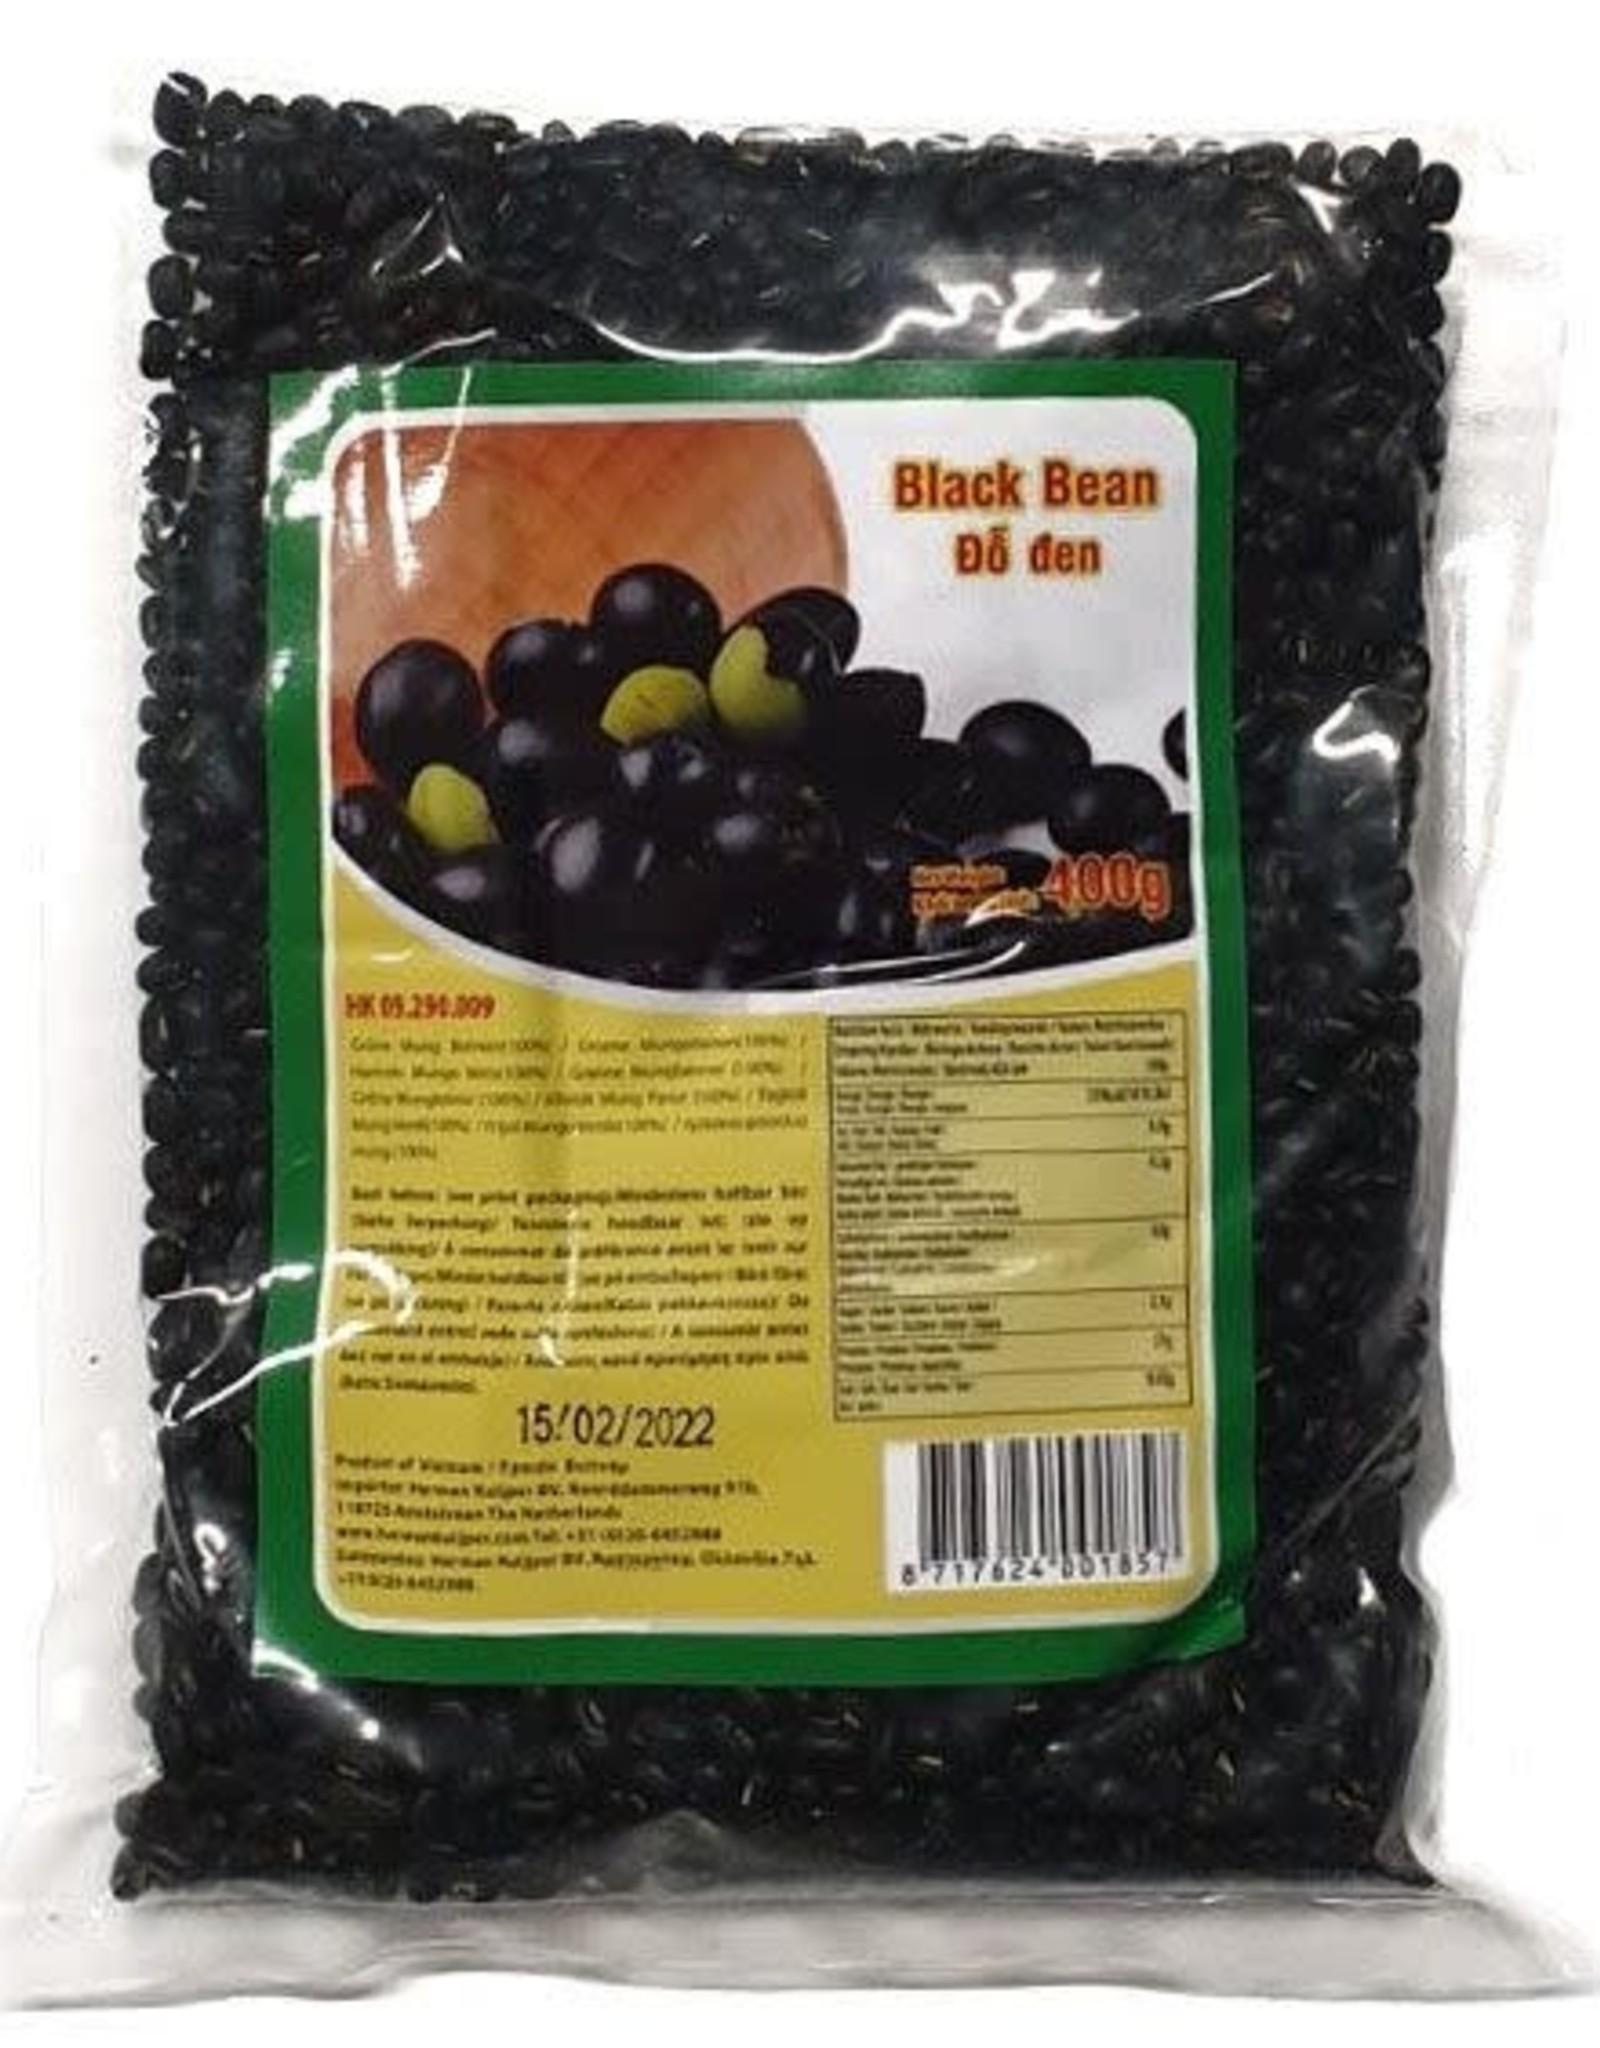 Black Bean 400G